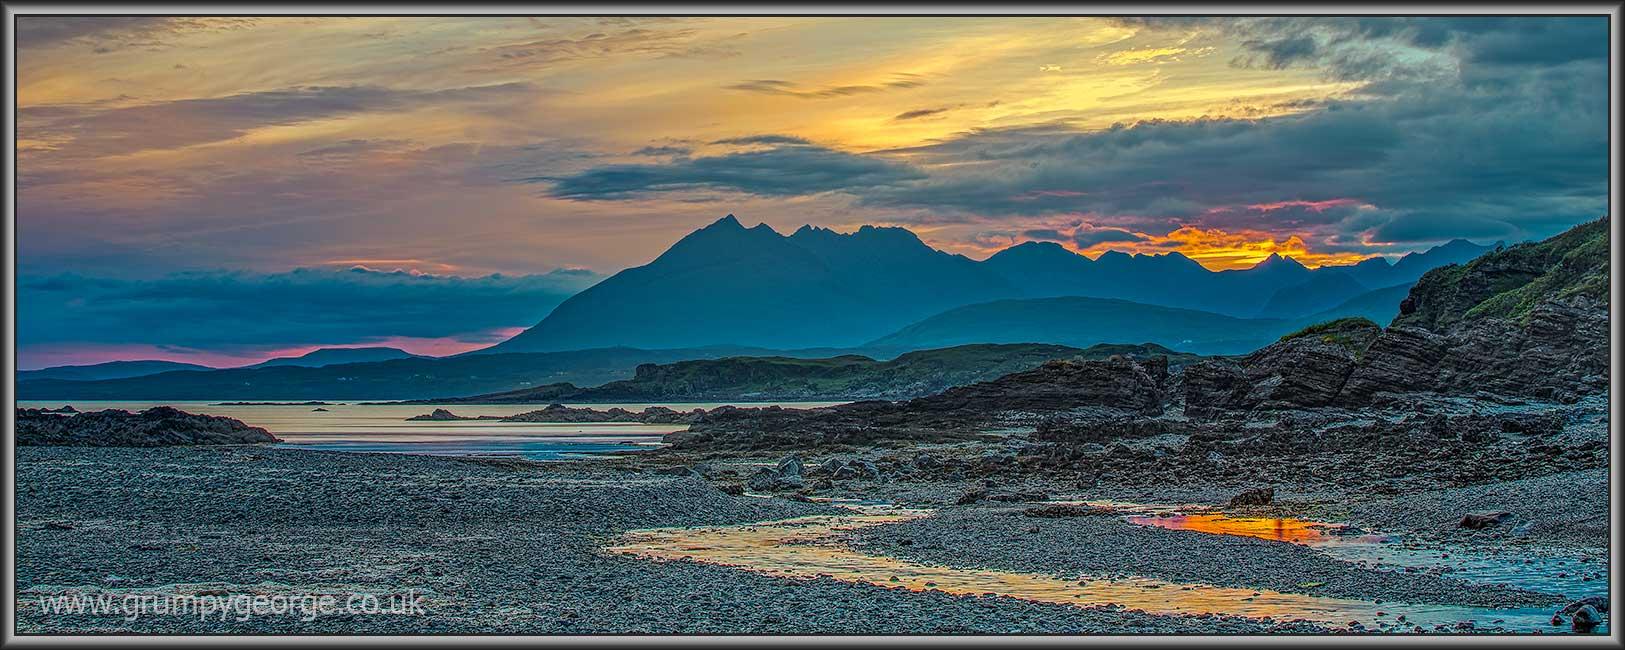 Achnacloich sunset Skye 30